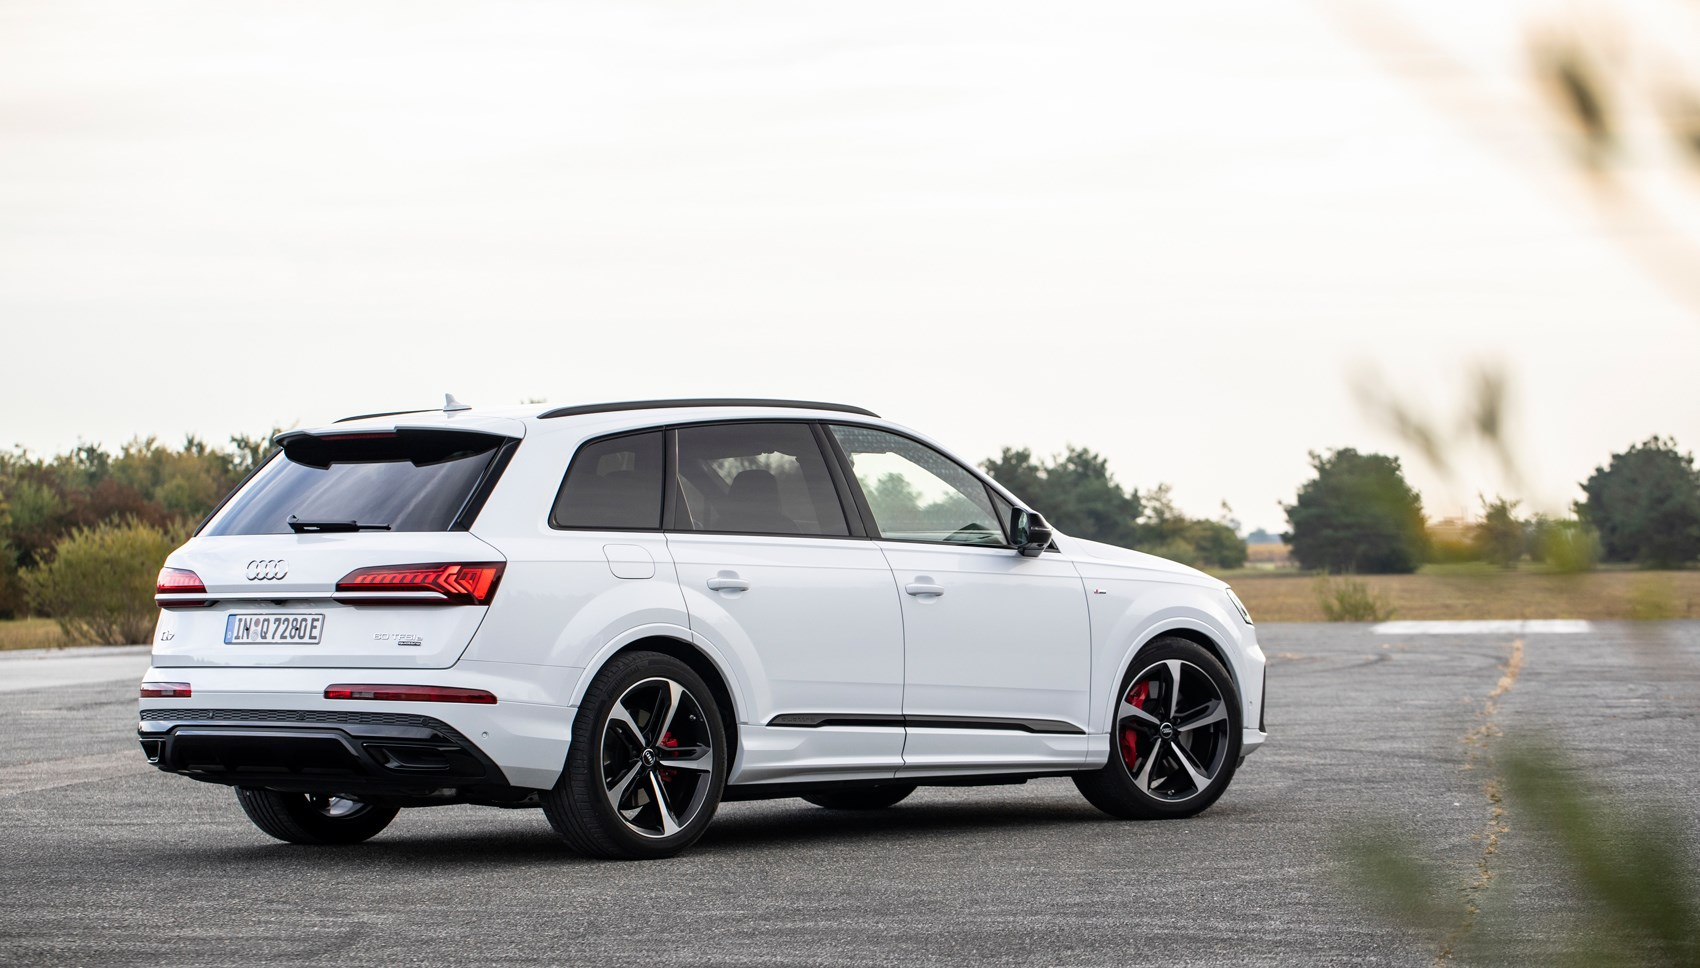 Audi Q7 hybrid rear quarter